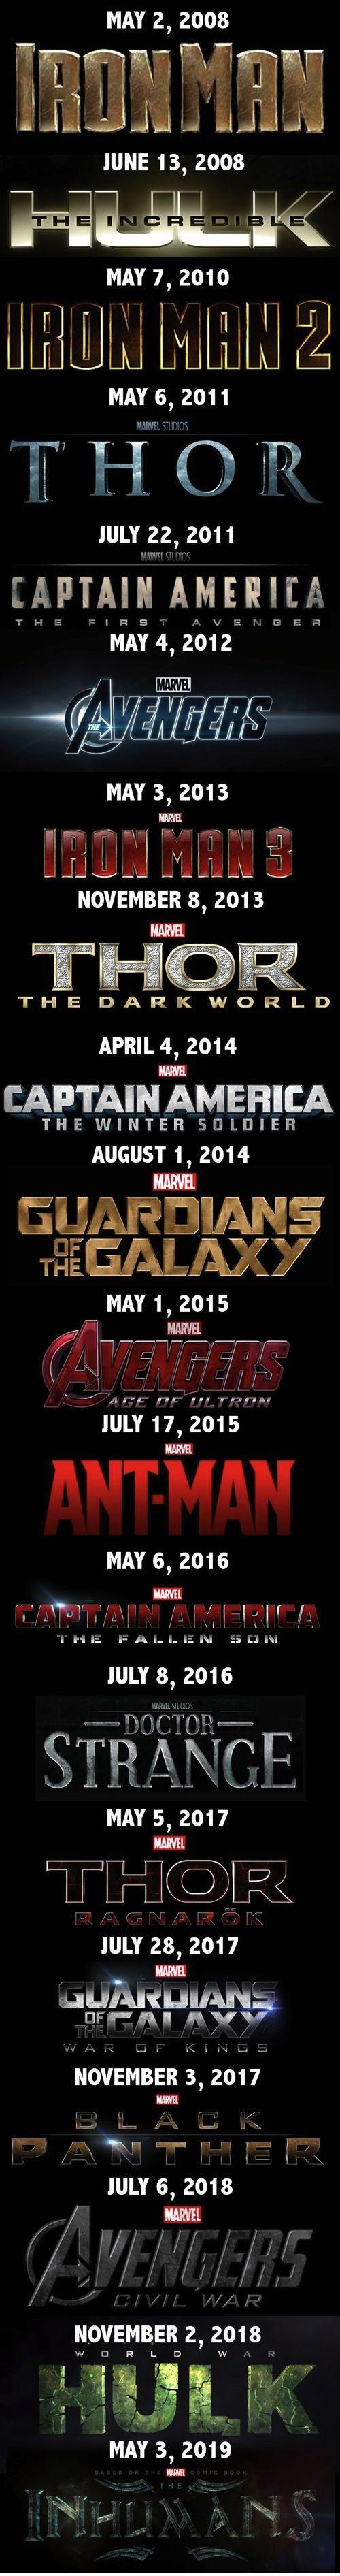 Marvel, Marvel everywhere.